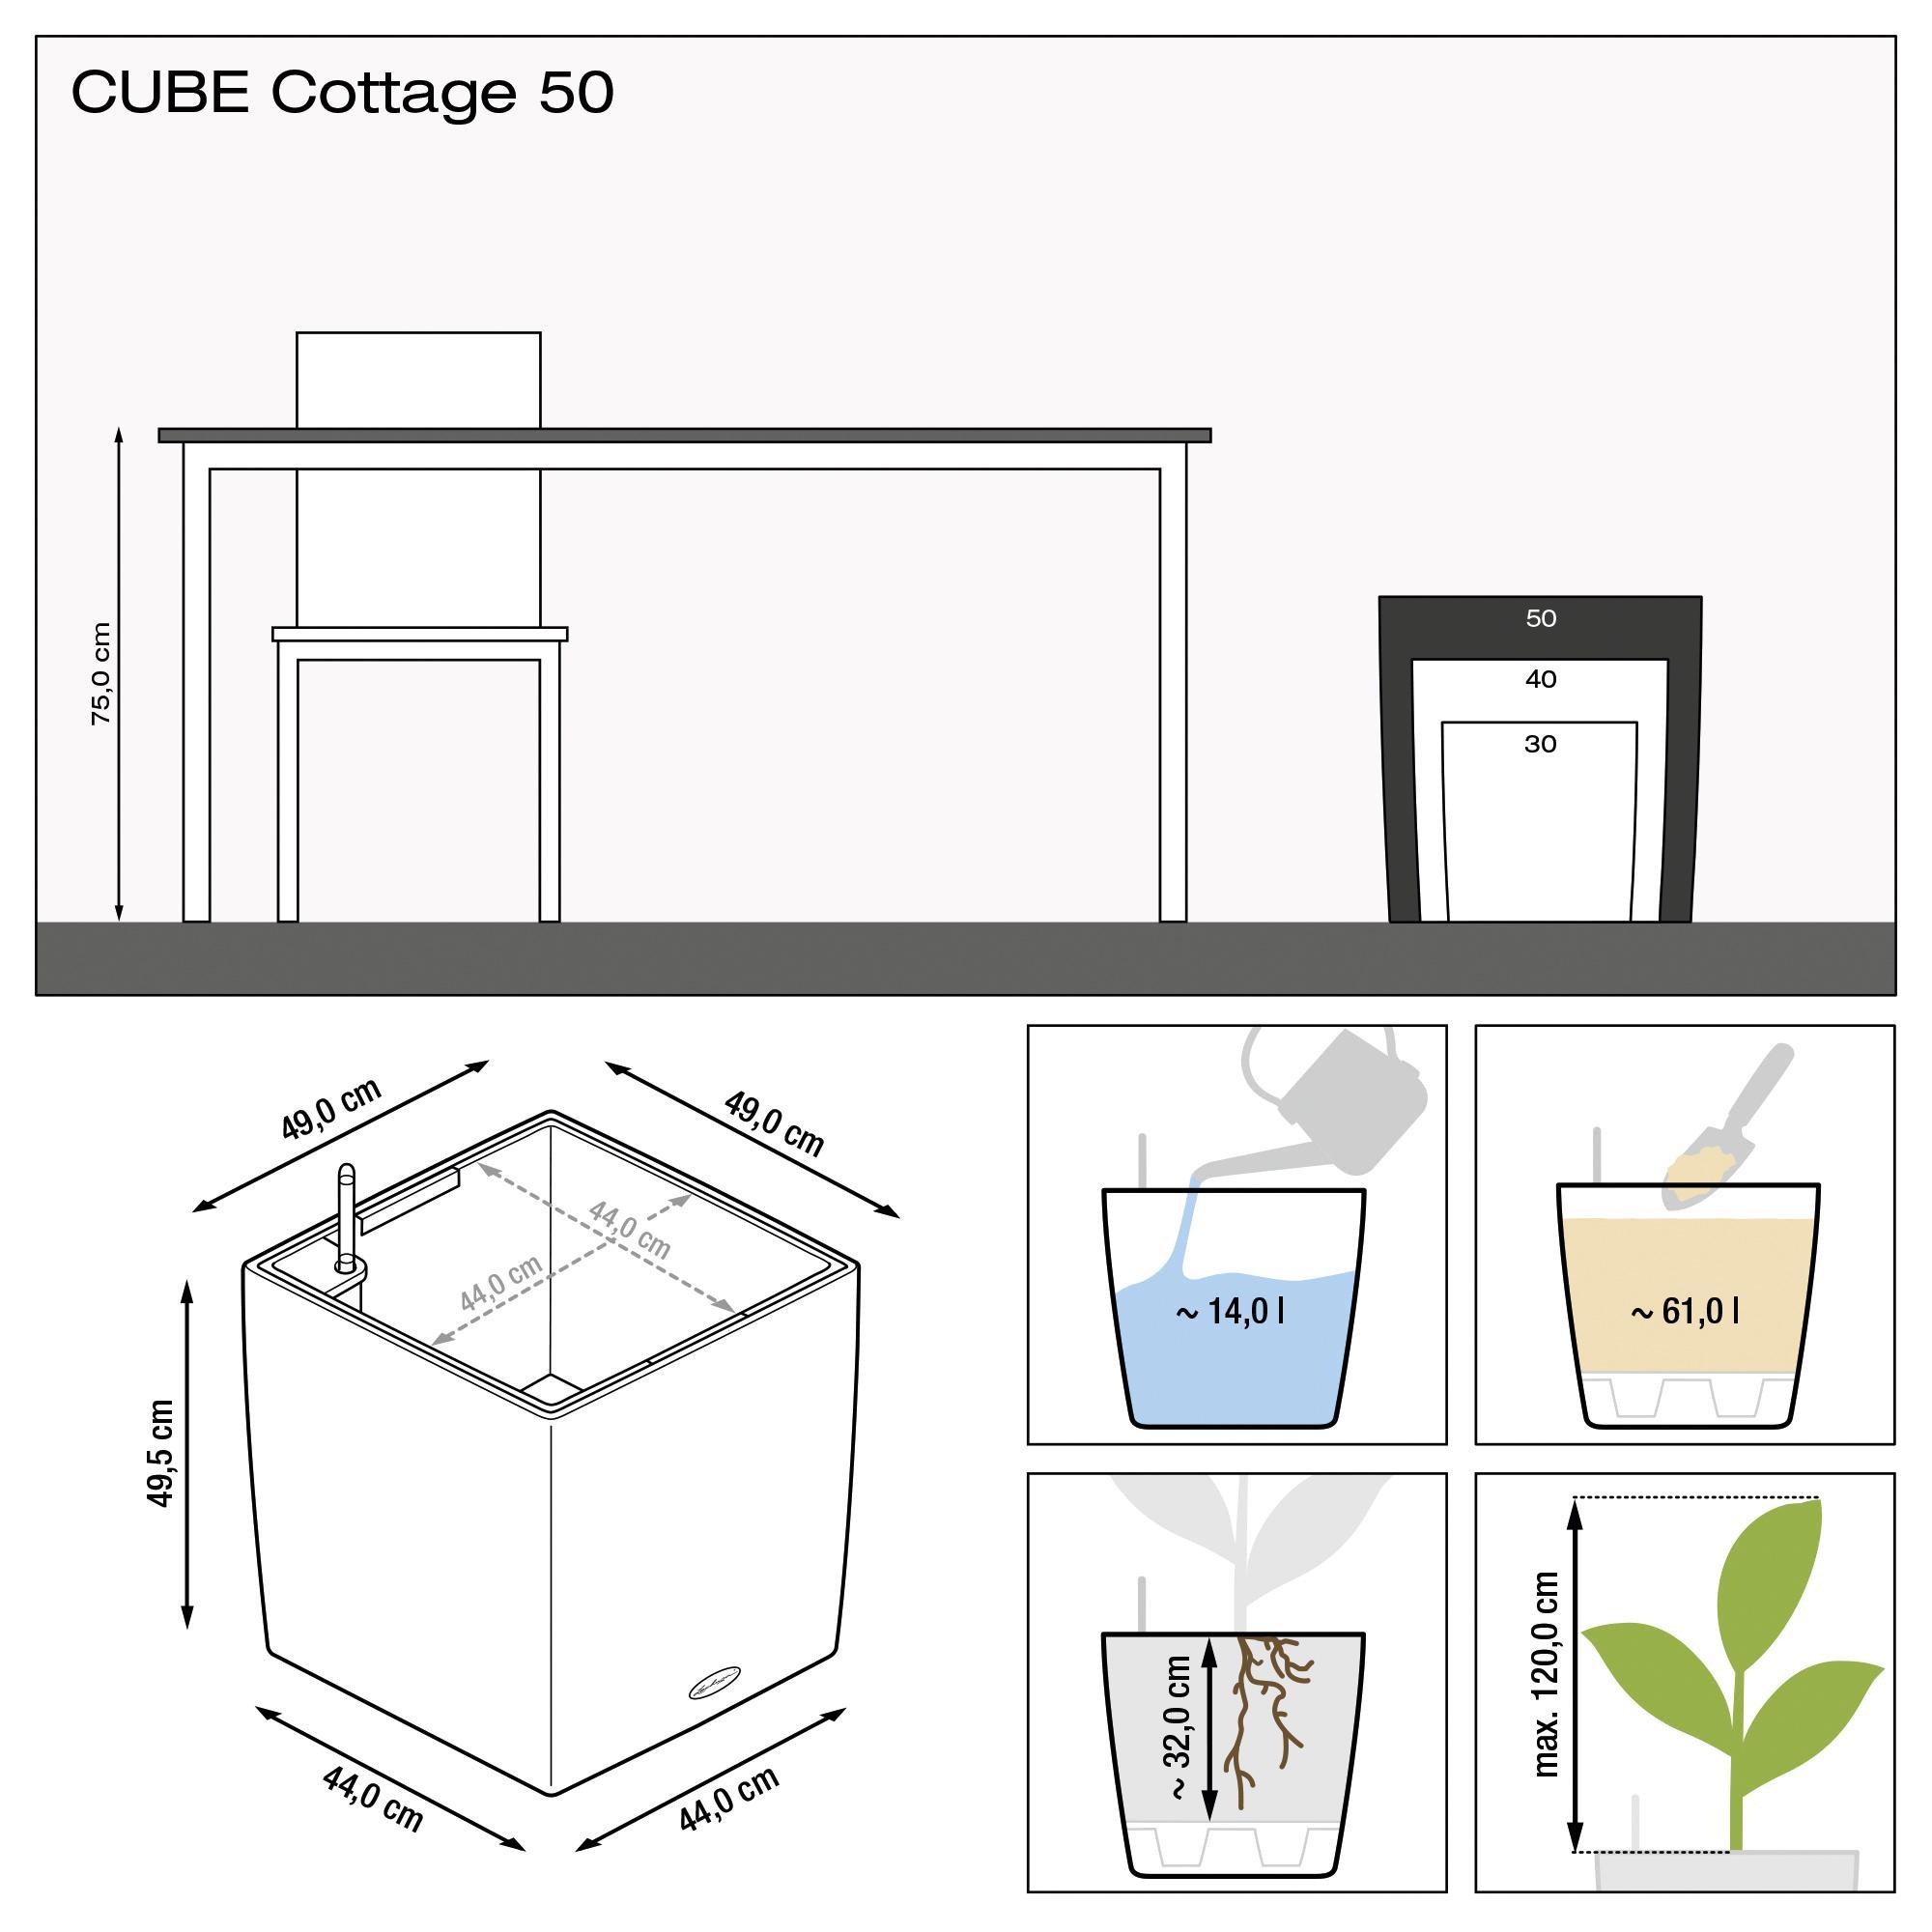 CUBE Cottage 50 granite - Image 3